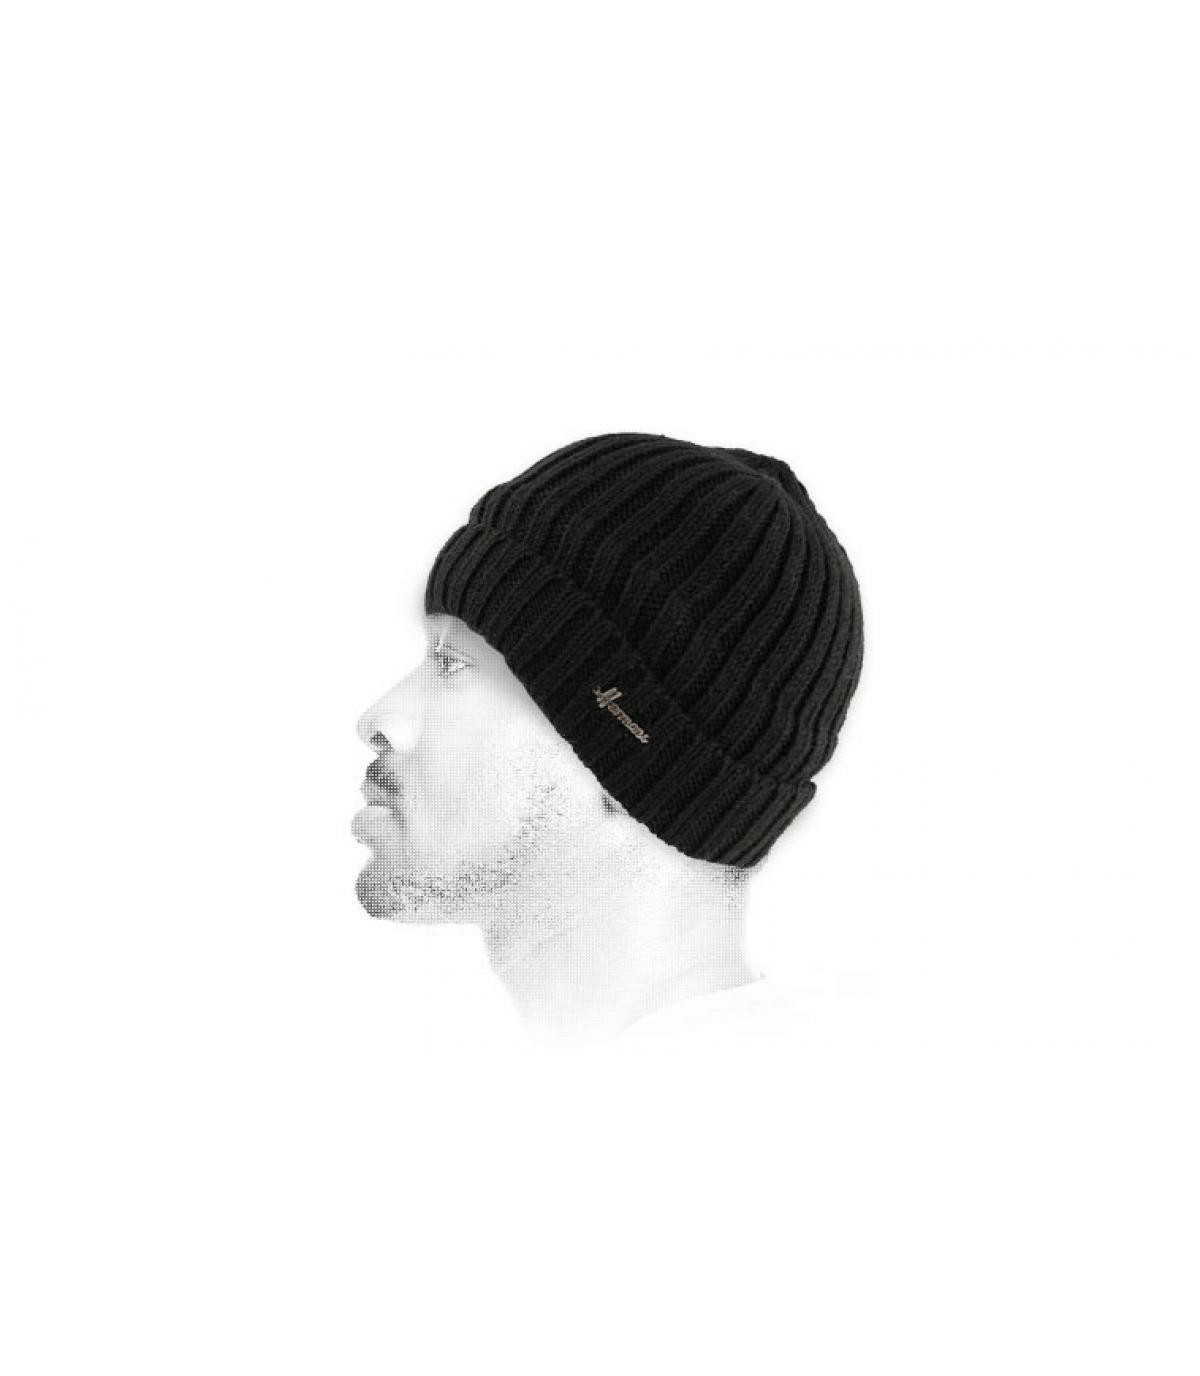 Mütze Revers Wolle schwarz